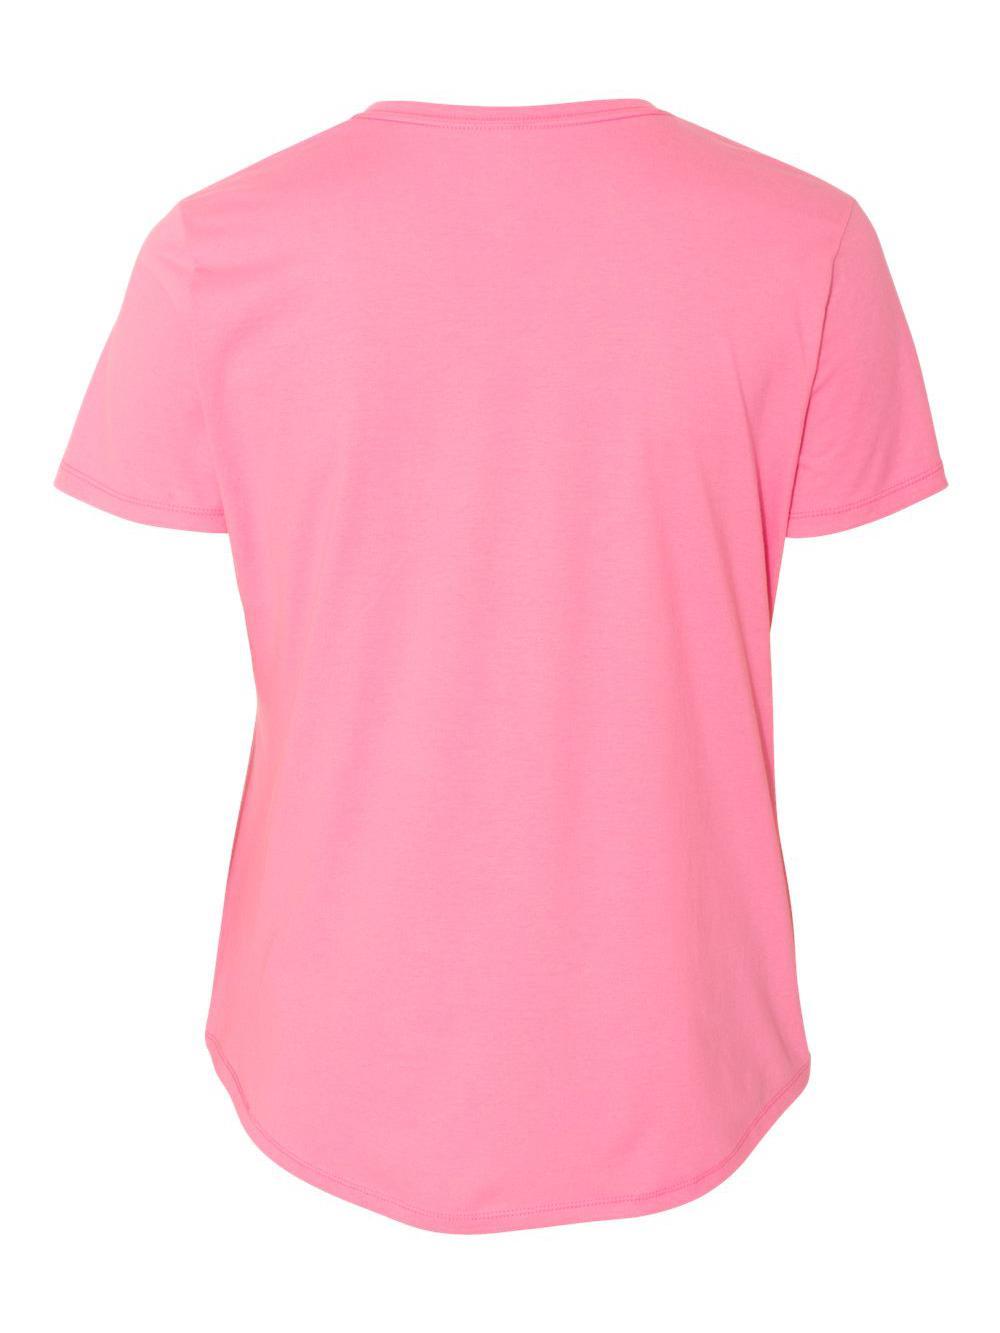 b792c0c0156b2 Just My Size - Women s Short Sleeve V-Neck Tee - JMS30